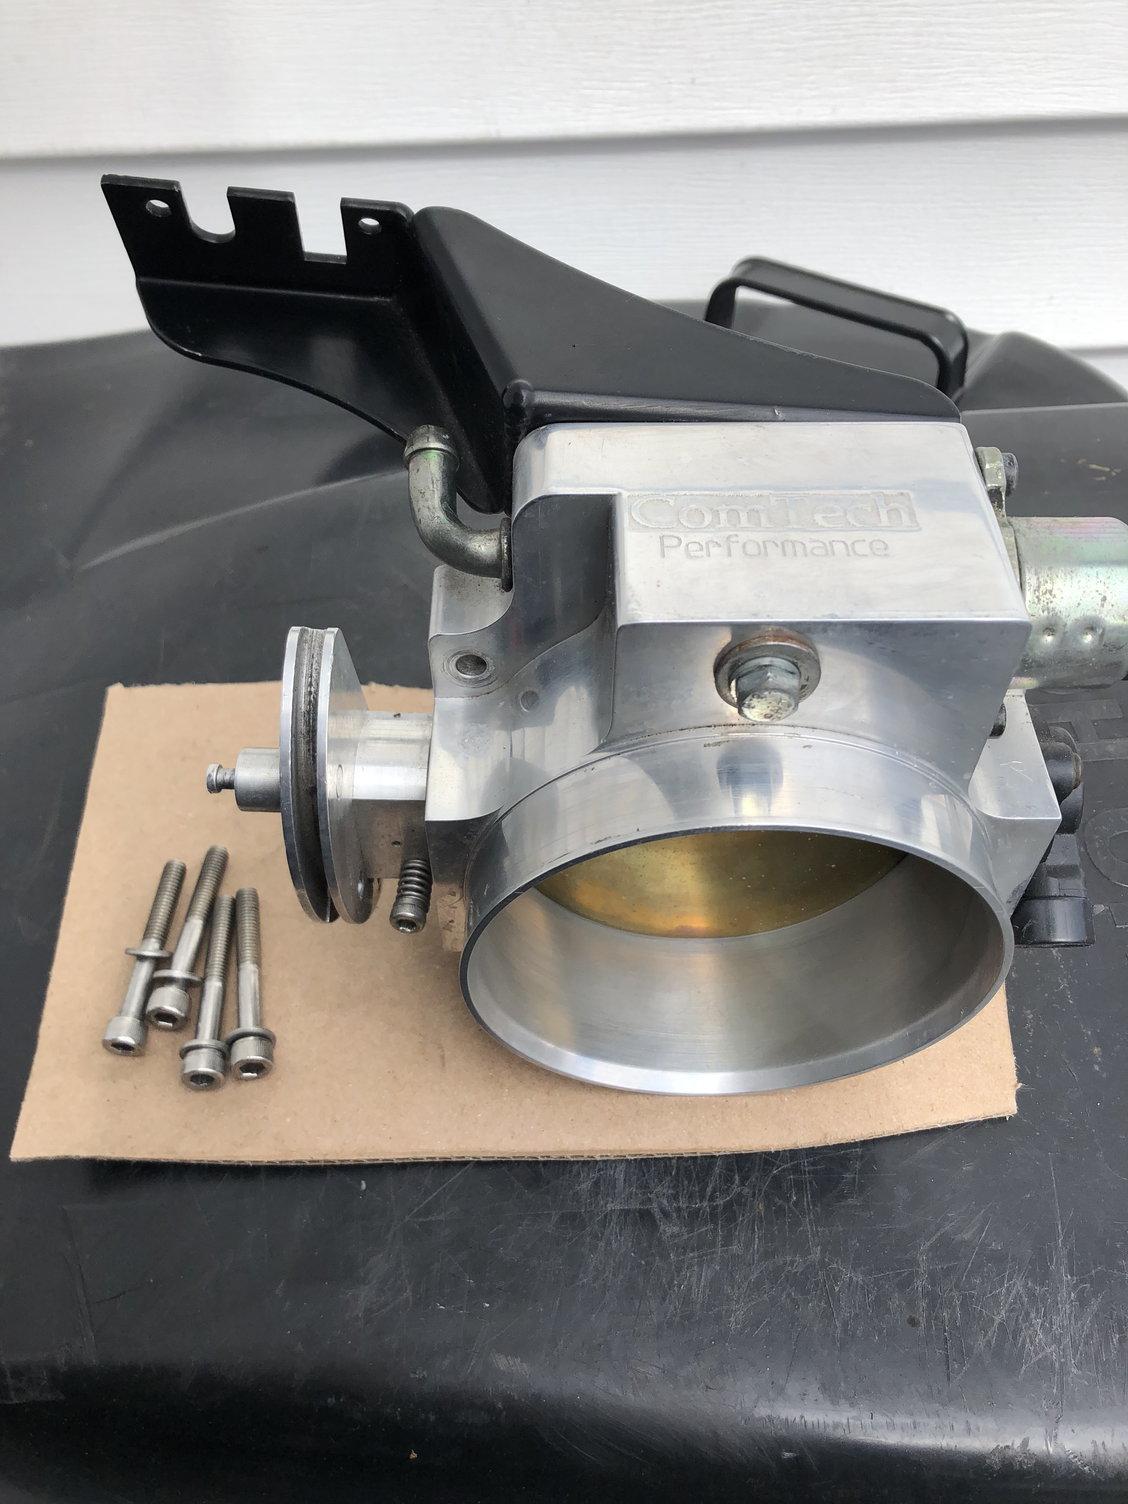 FS (For Sale) 102mm throttle body, Texas Speed 100mm MAF